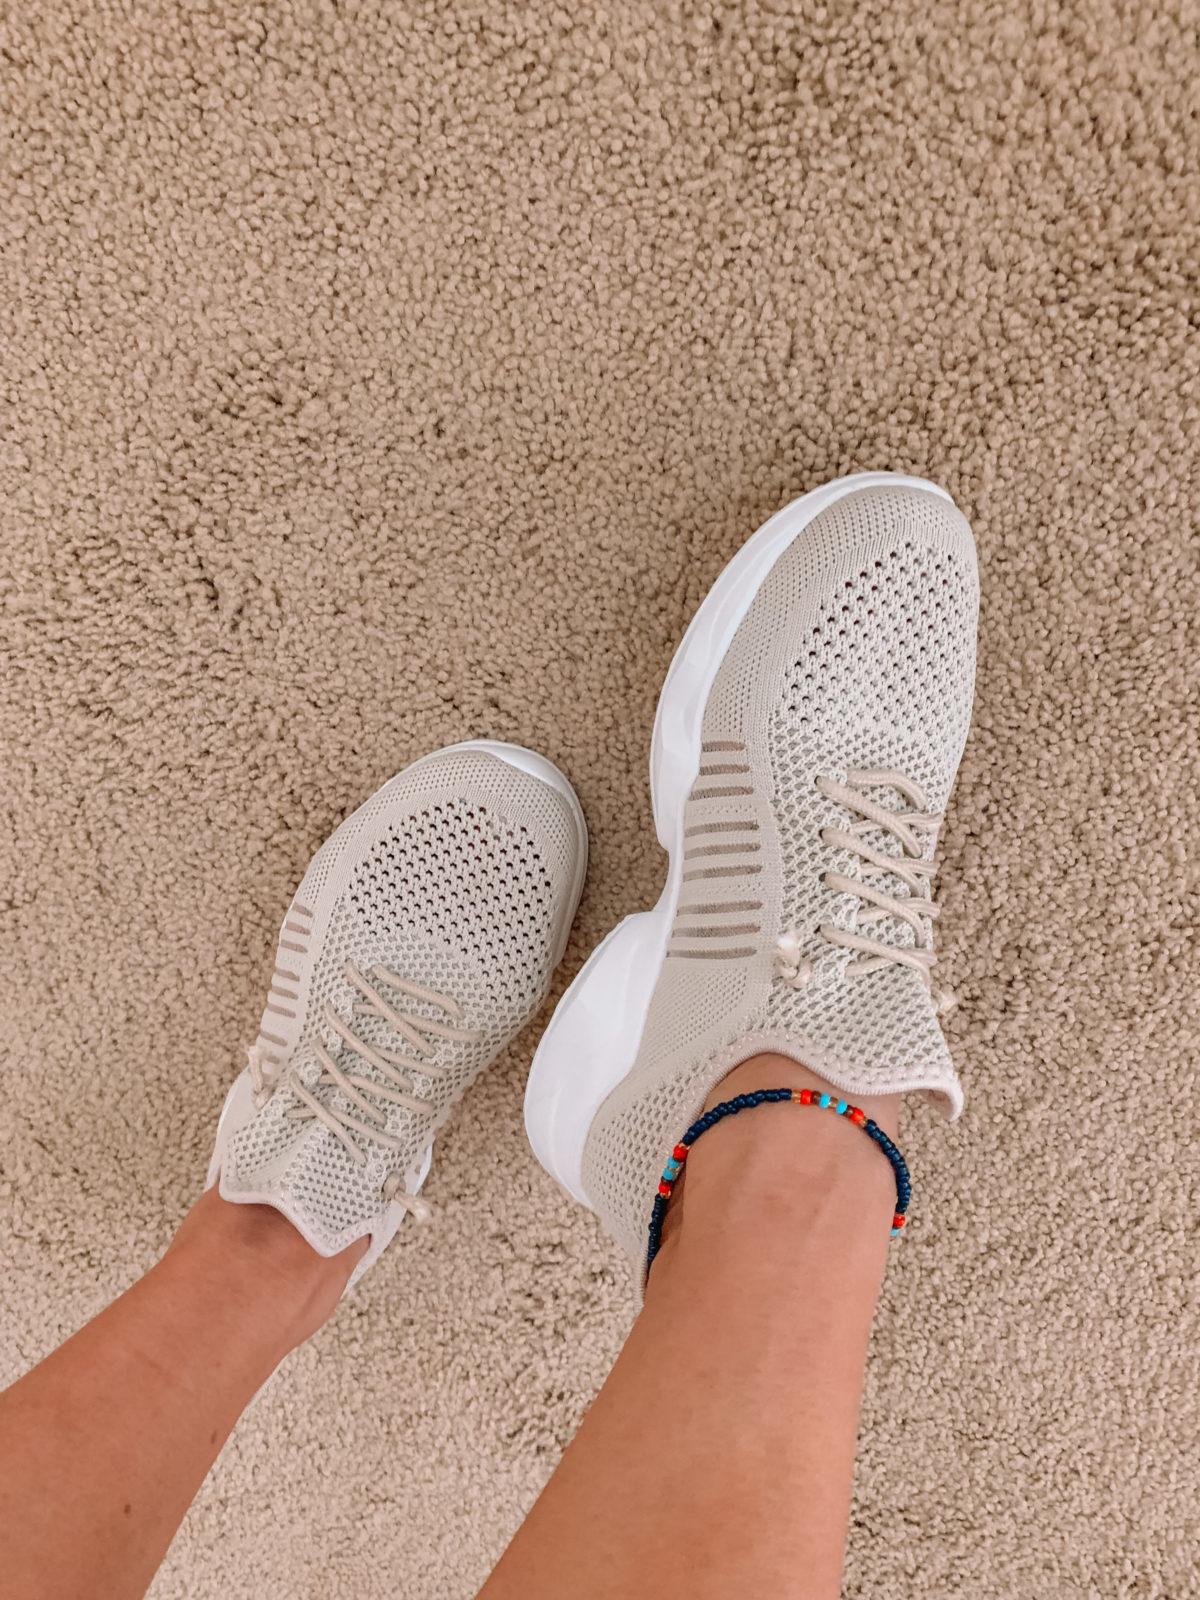 Amazon Fashion Faves, Slip on Sneakers